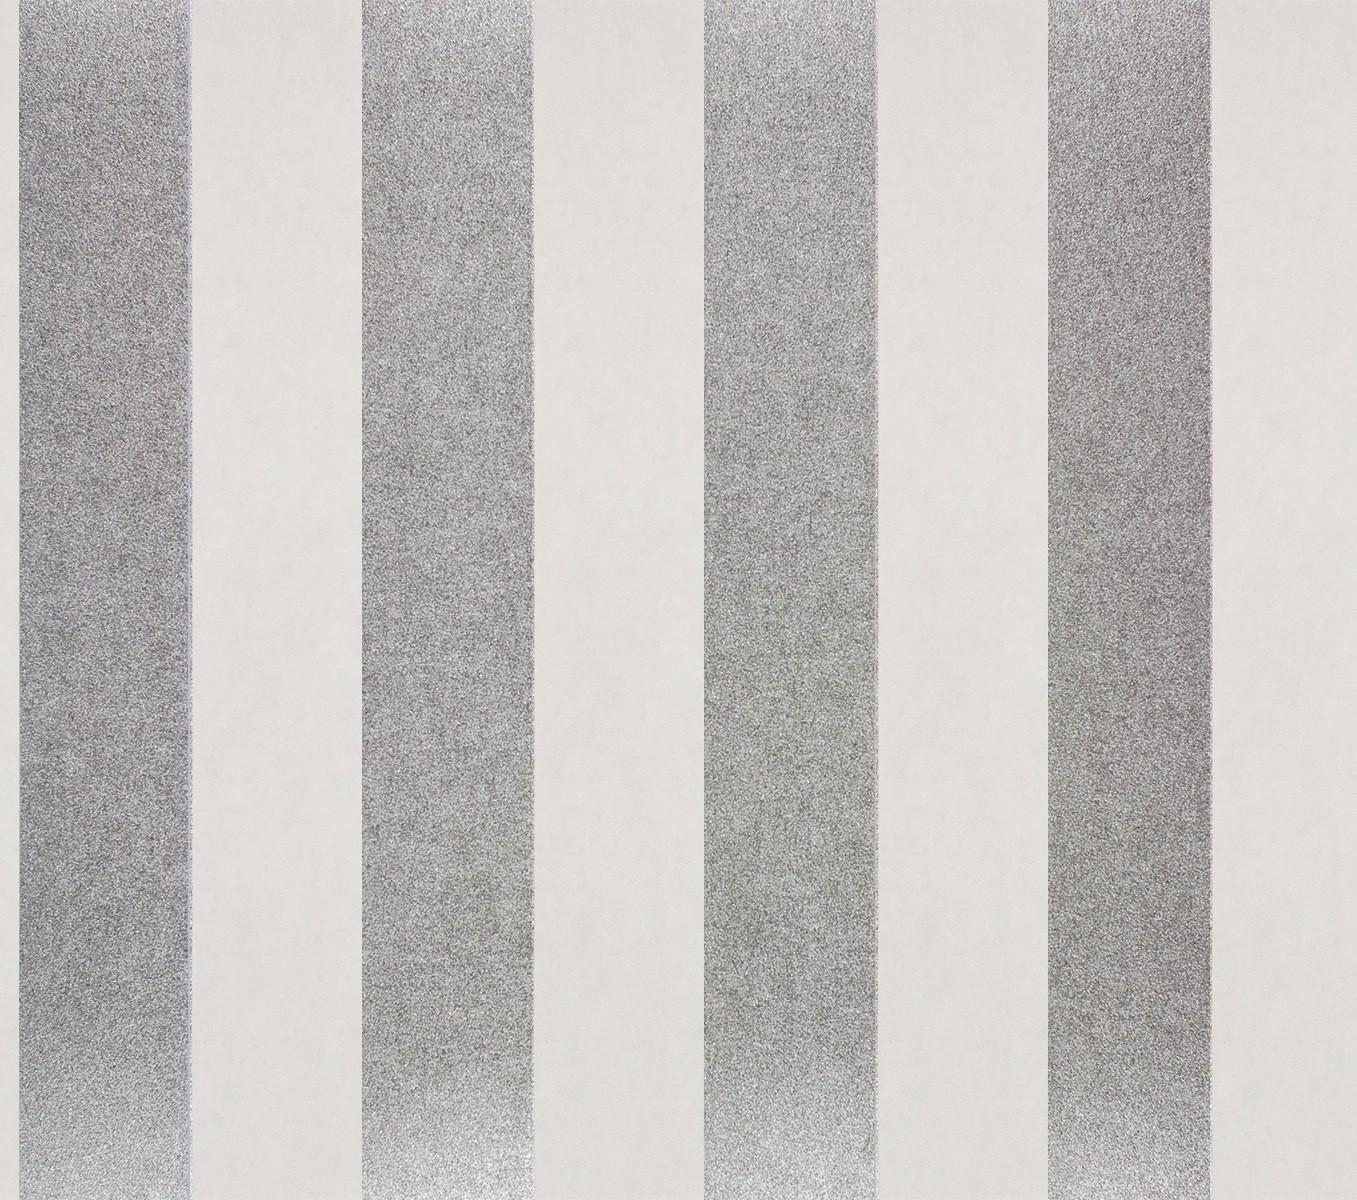 vliestapete streifen wei silber metallic tapeten rasch textil tapete comtesse 225432. Black Bedroom Furniture Sets. Home Design Ideas